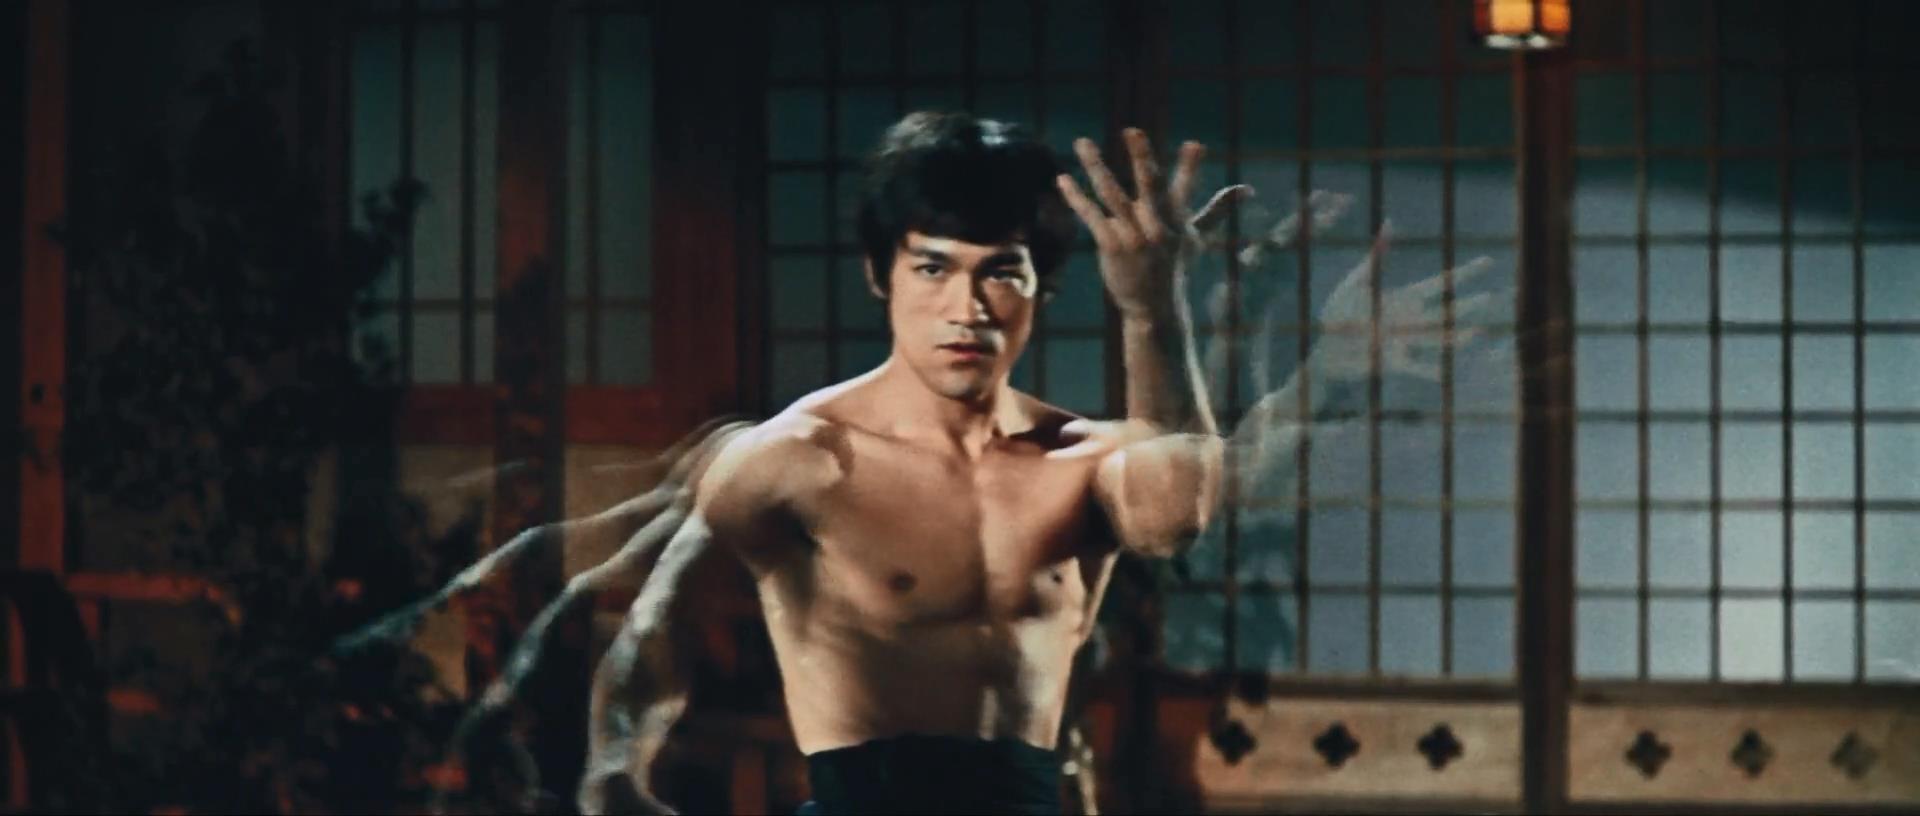 film arti marziali